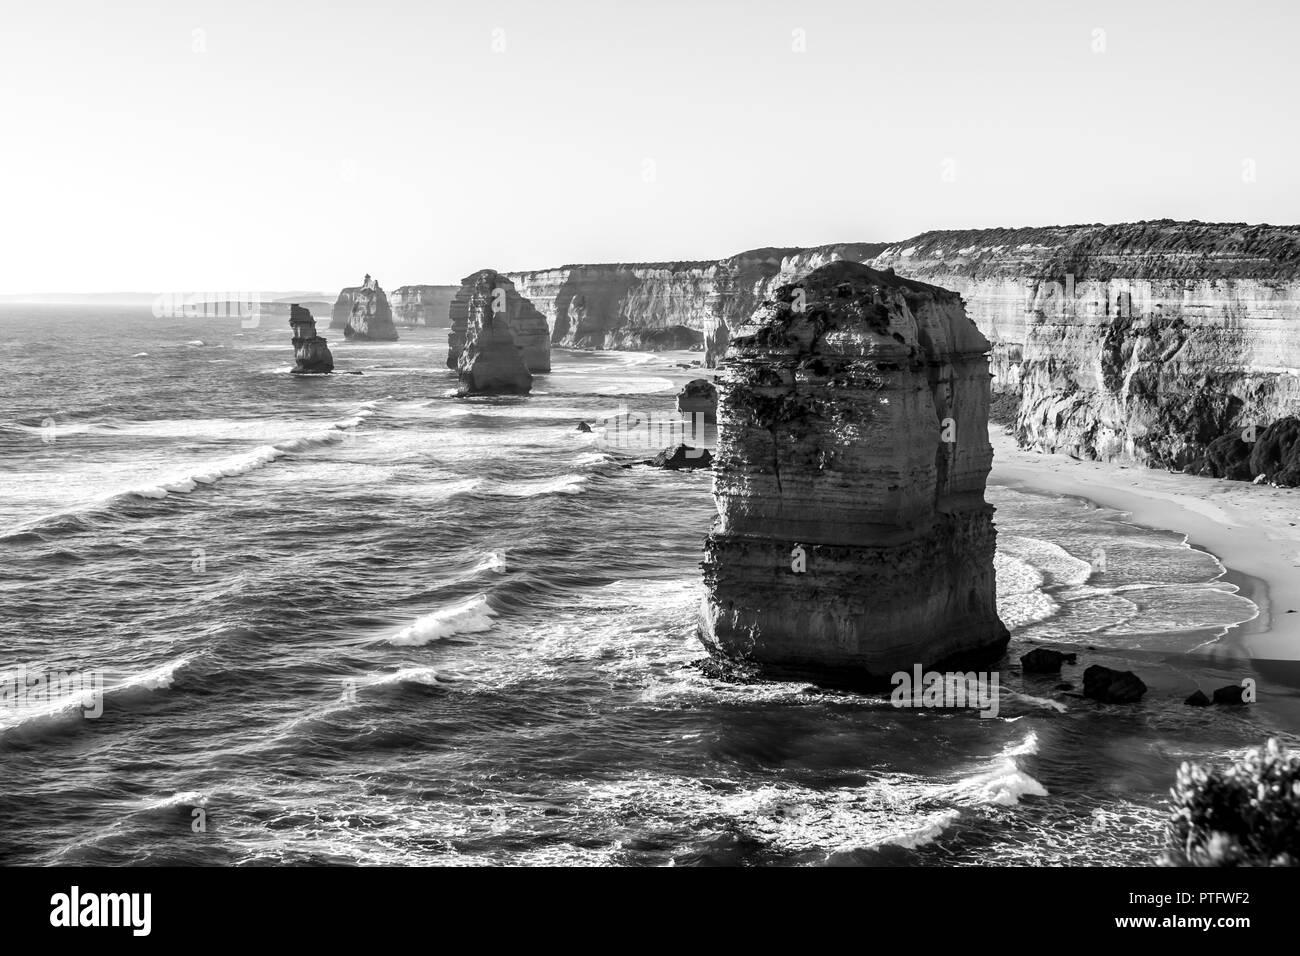 Twelve Apostles Sea Rocks near Great Ocean Road , Port Campbell National Park, Australia. Black and white image - Stock Image